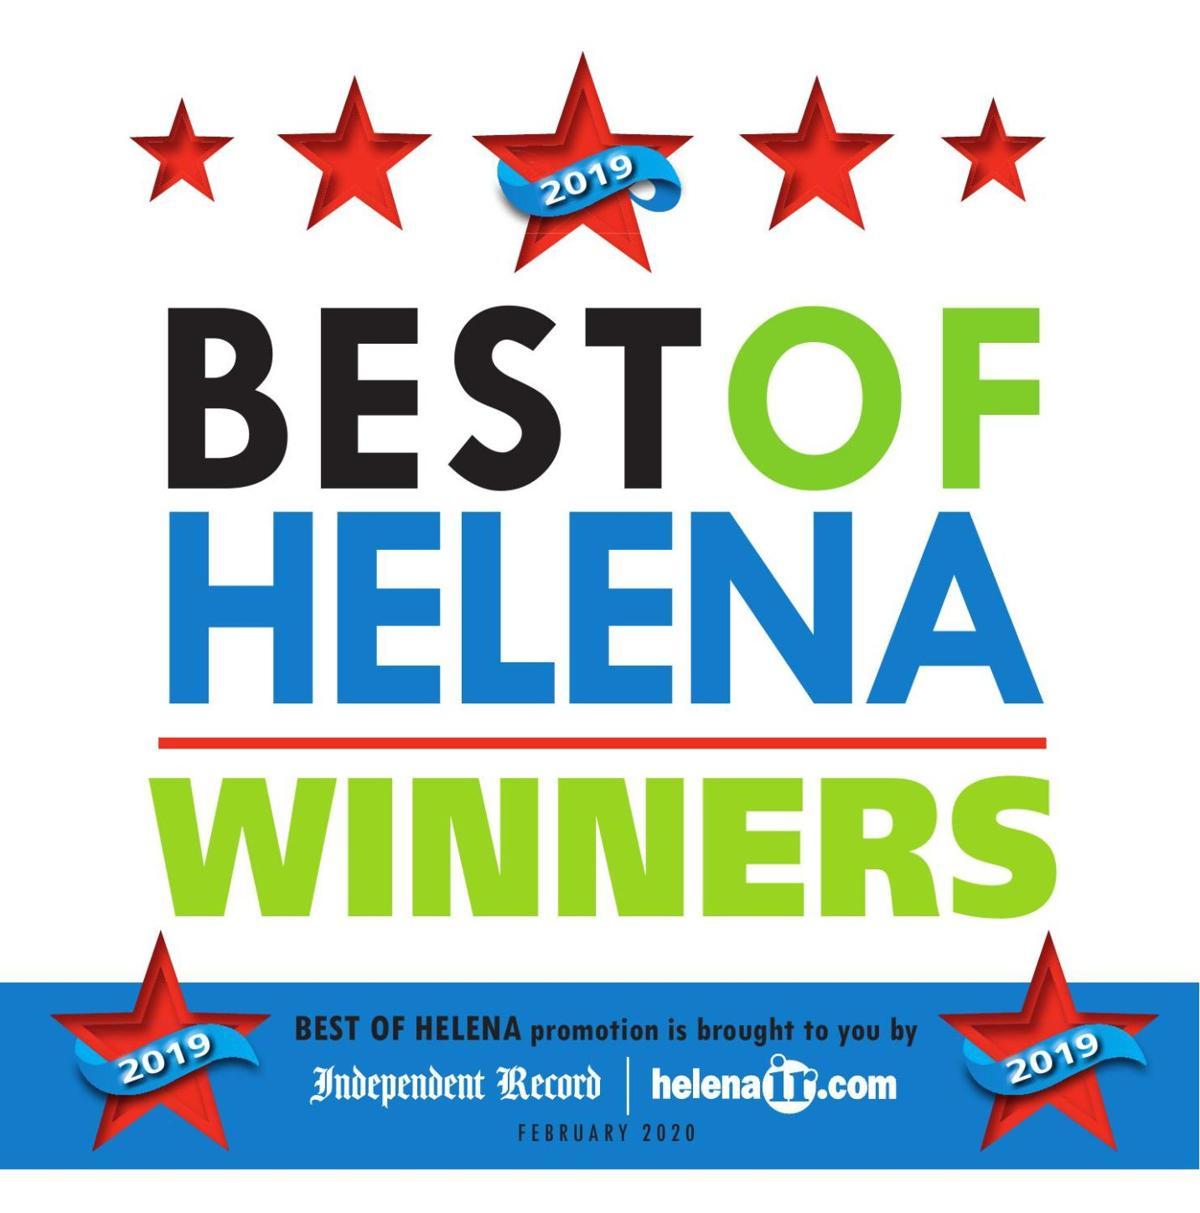 Best of Helena 2019